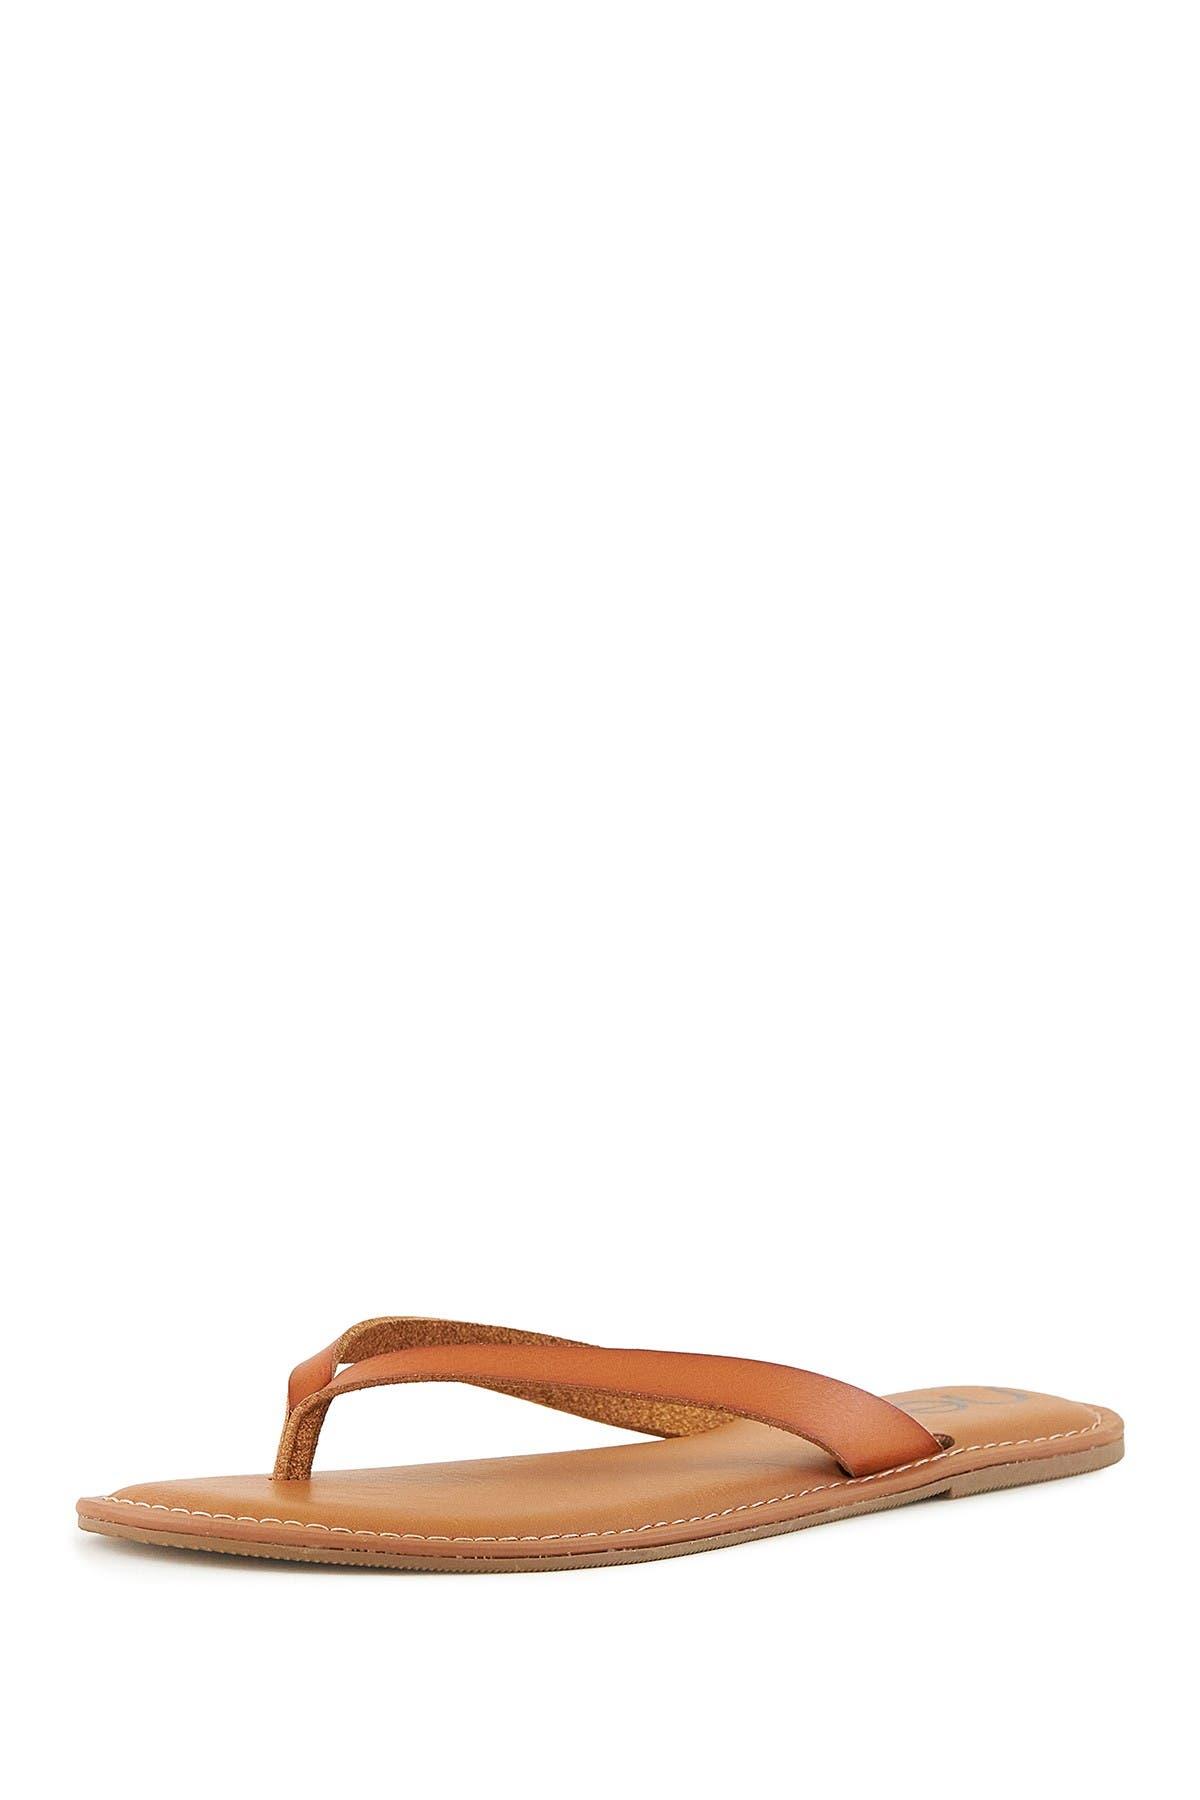 Image of NEST FOOTWEAR Slim Strap Thong Sandal